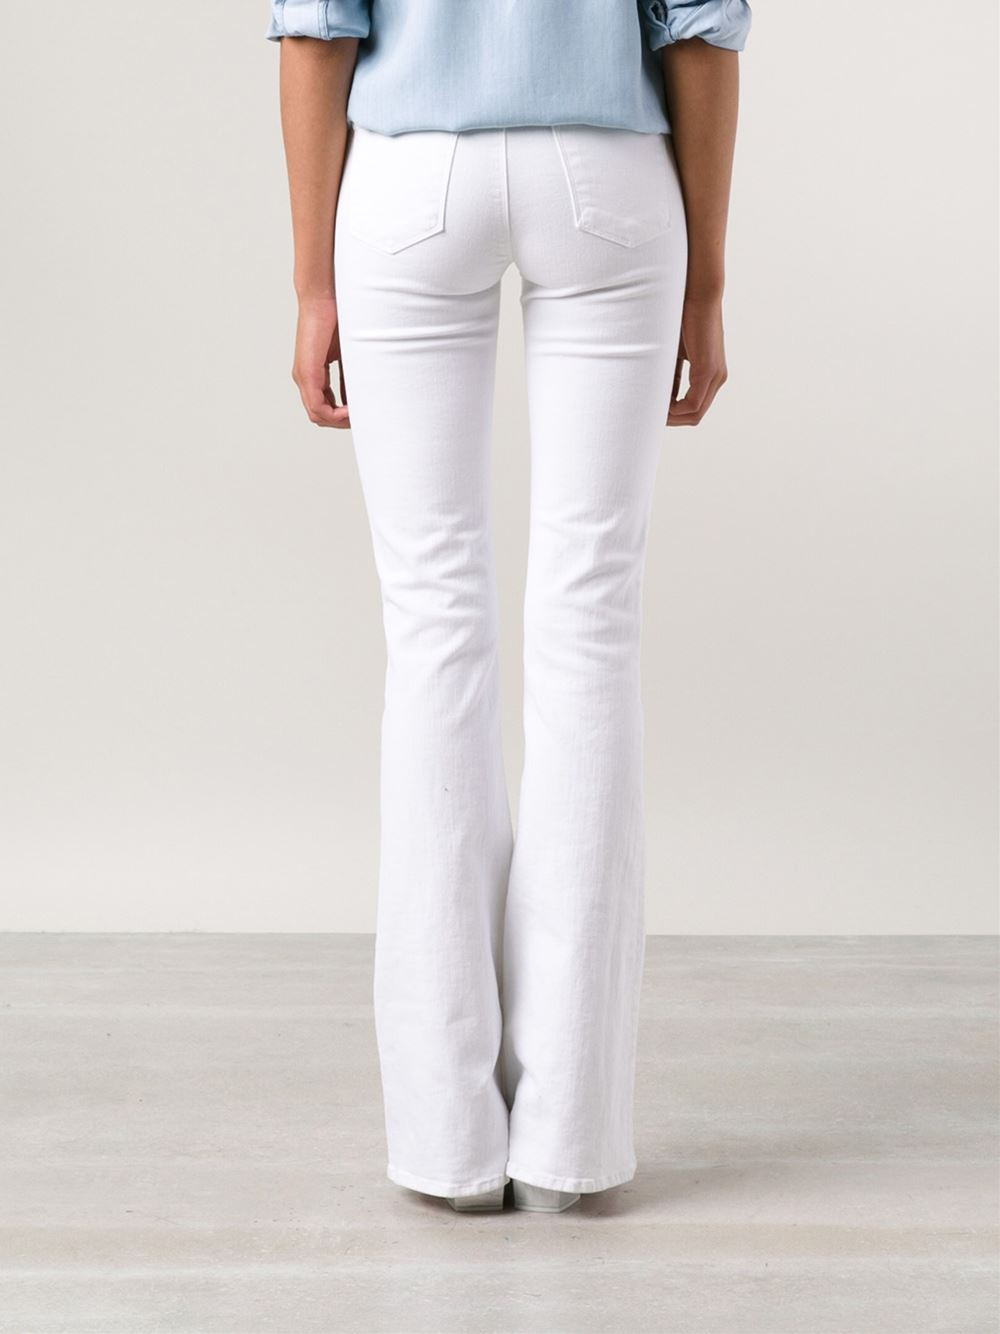 J brand 'Martini' Flare Jeans in White | Lyst